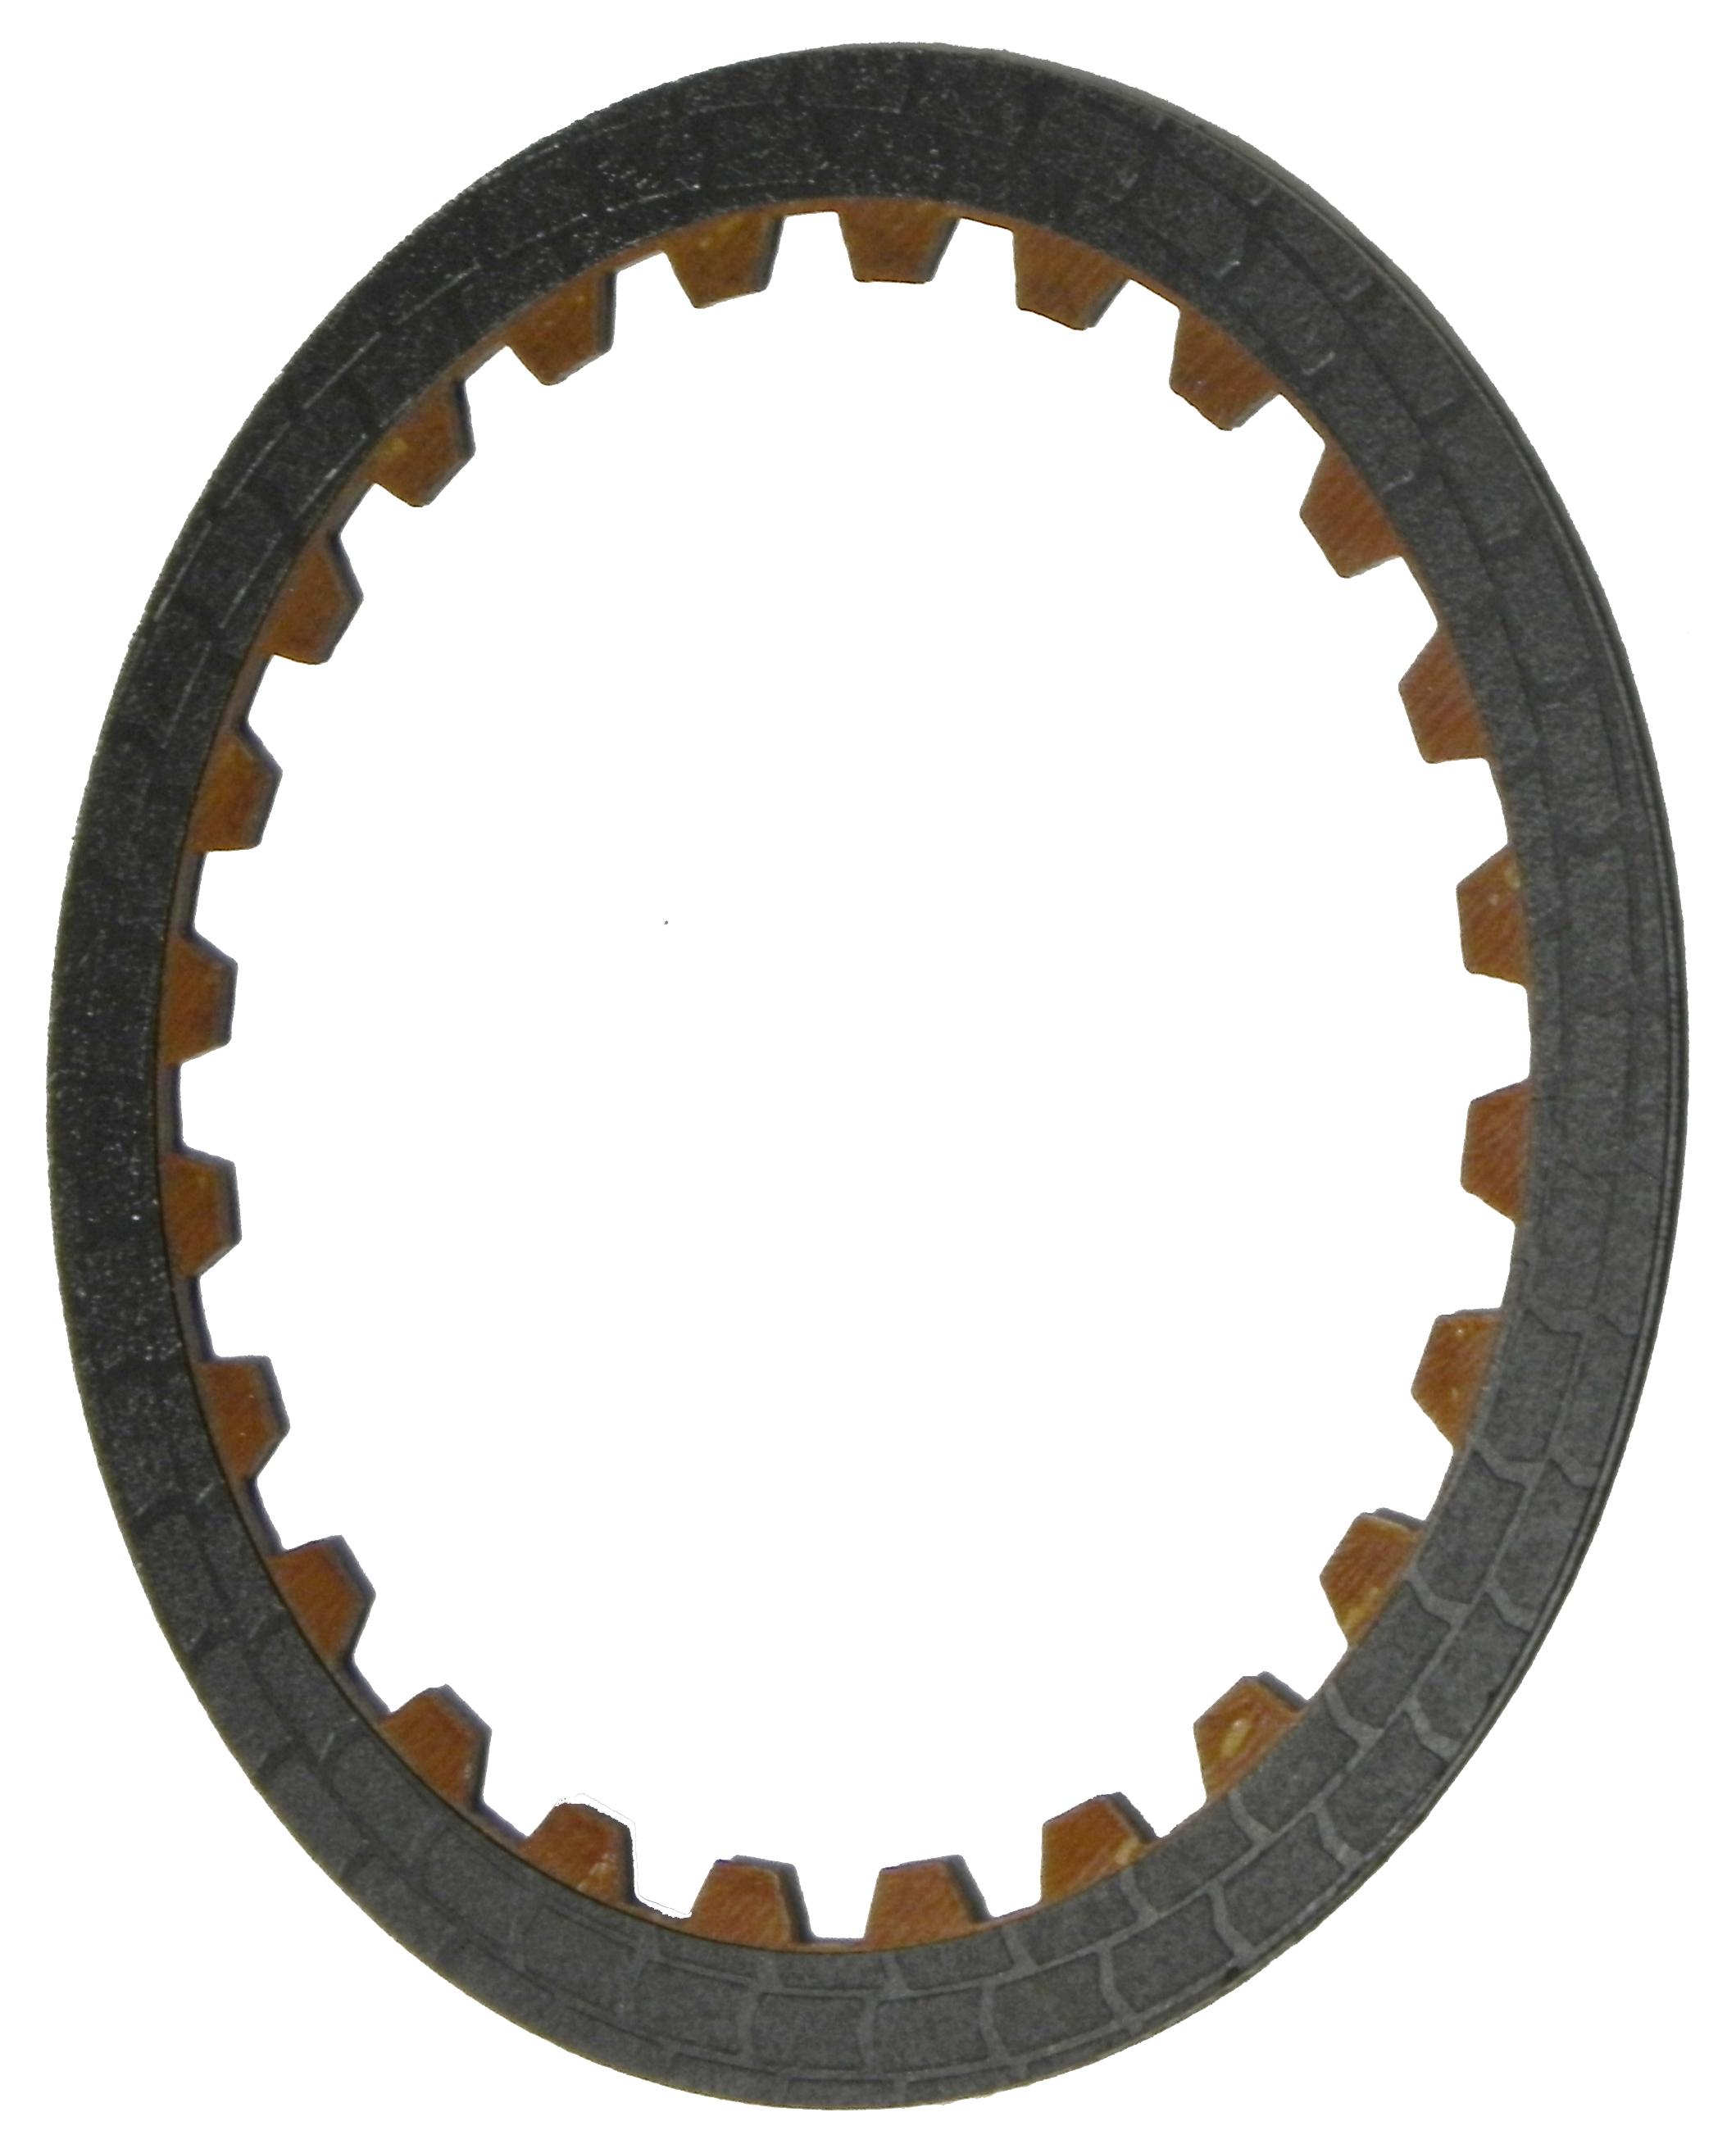 RH560285 | 2011-ON Friction Clutch Plate (HT) Hybrid Technology A Clutch Proprietary High Energy (HT)